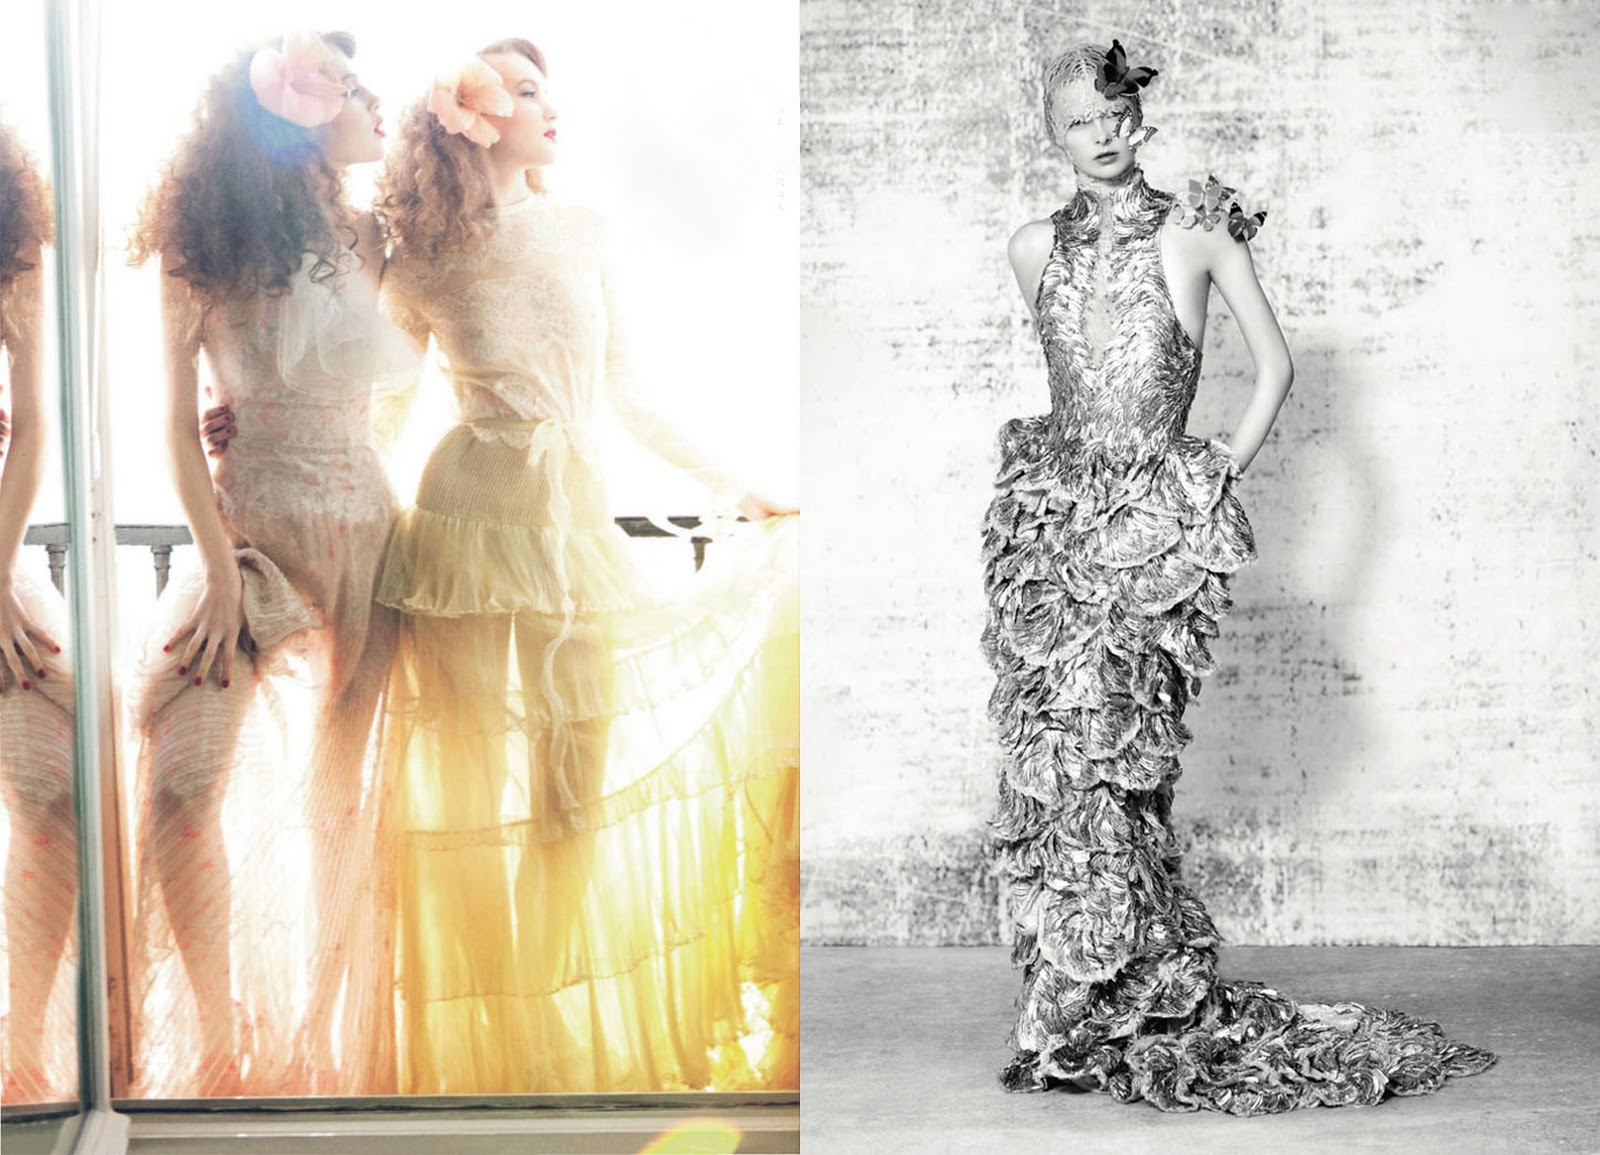 http://3.bp.blogspot.com/-7sdDLzM4UO4/UIvOJ6jTBMI/AAAAAAAADRE/VNNcLkkOtRw/s1600/m+Anais+Pouliot+by+Ellen+von+Unwerth+for+Vogue+Russia+April+2011coutureru3.jpgElza+Luijendijk+Wears+Butterfly+Beauty+for+Ben+Toms%E2%80%99+Dazed+&+Confused+Shootbutterfly5.jpg